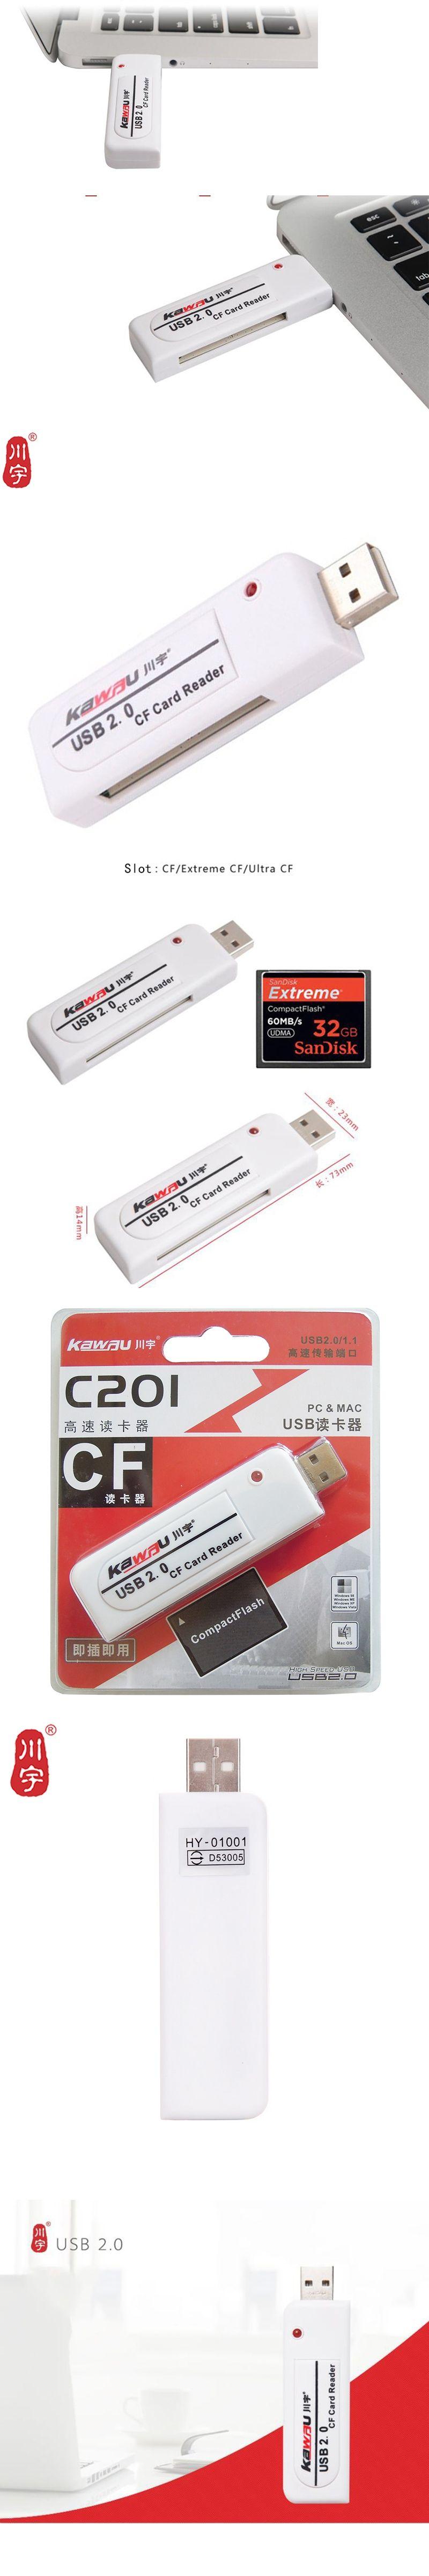 Kawau Usb 20 Microsd Card Reader Supports Up To 64gb With Cf Slot C201